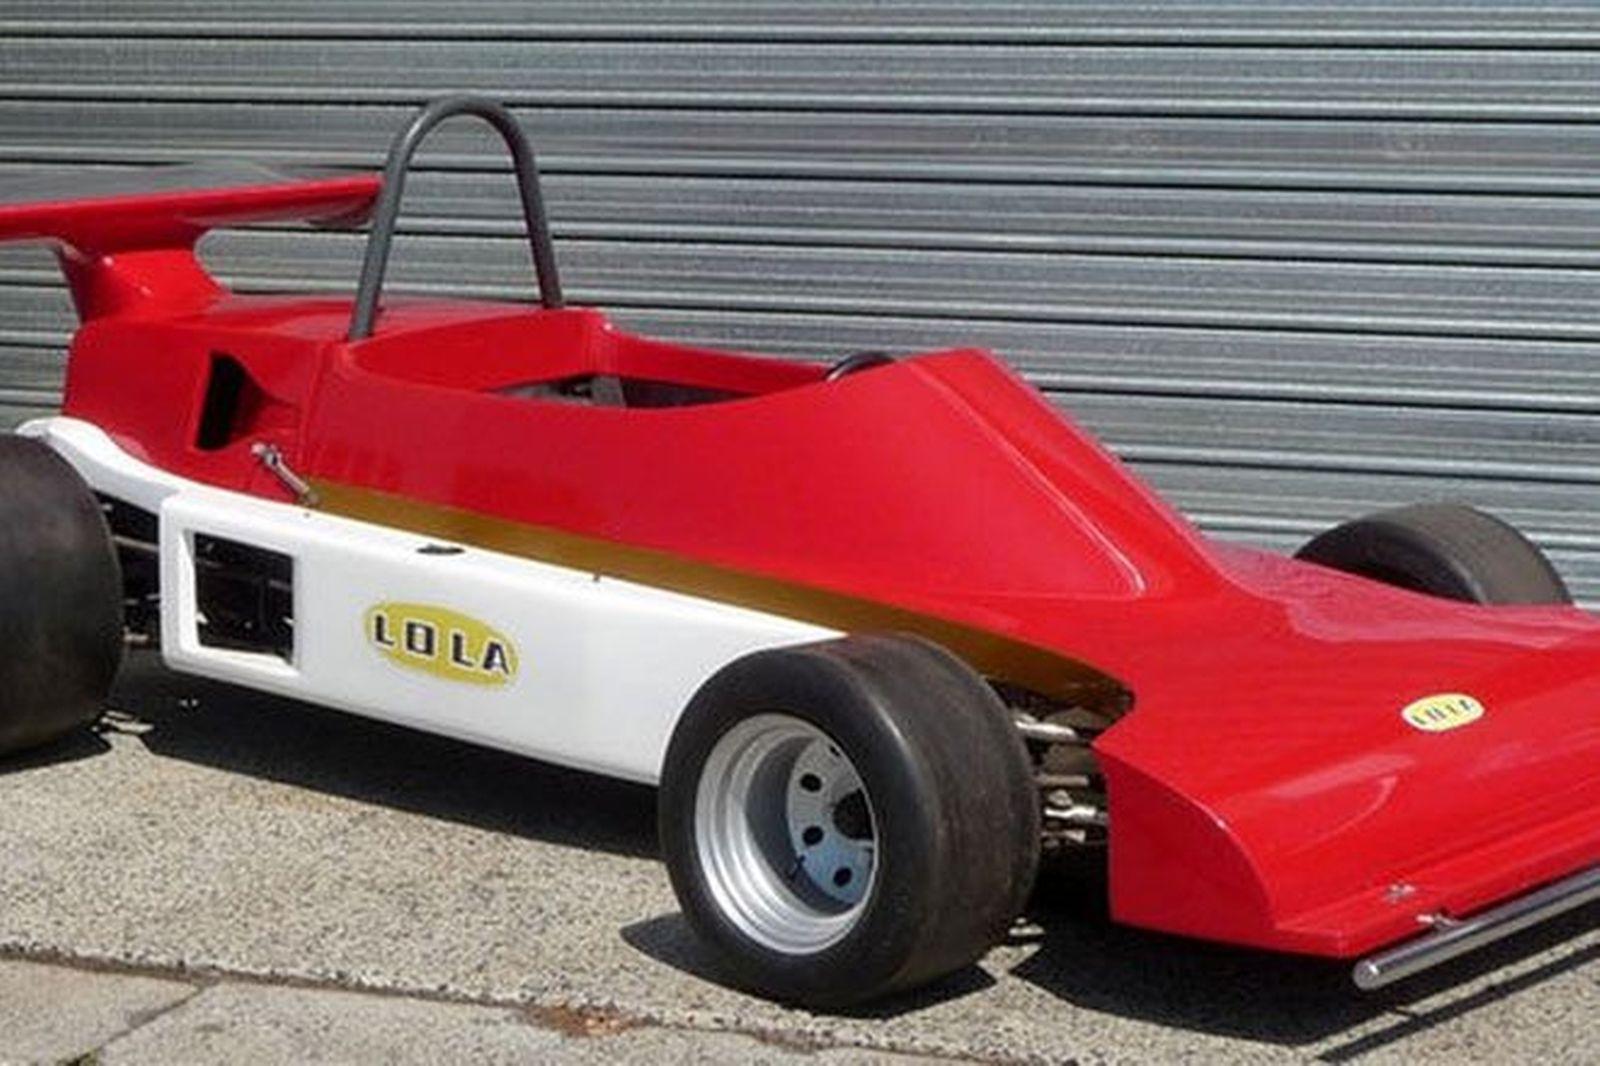 Sold: Lola Type 506 \'Mini GP\' Race Car Auctions - Lot 35 - Shannons